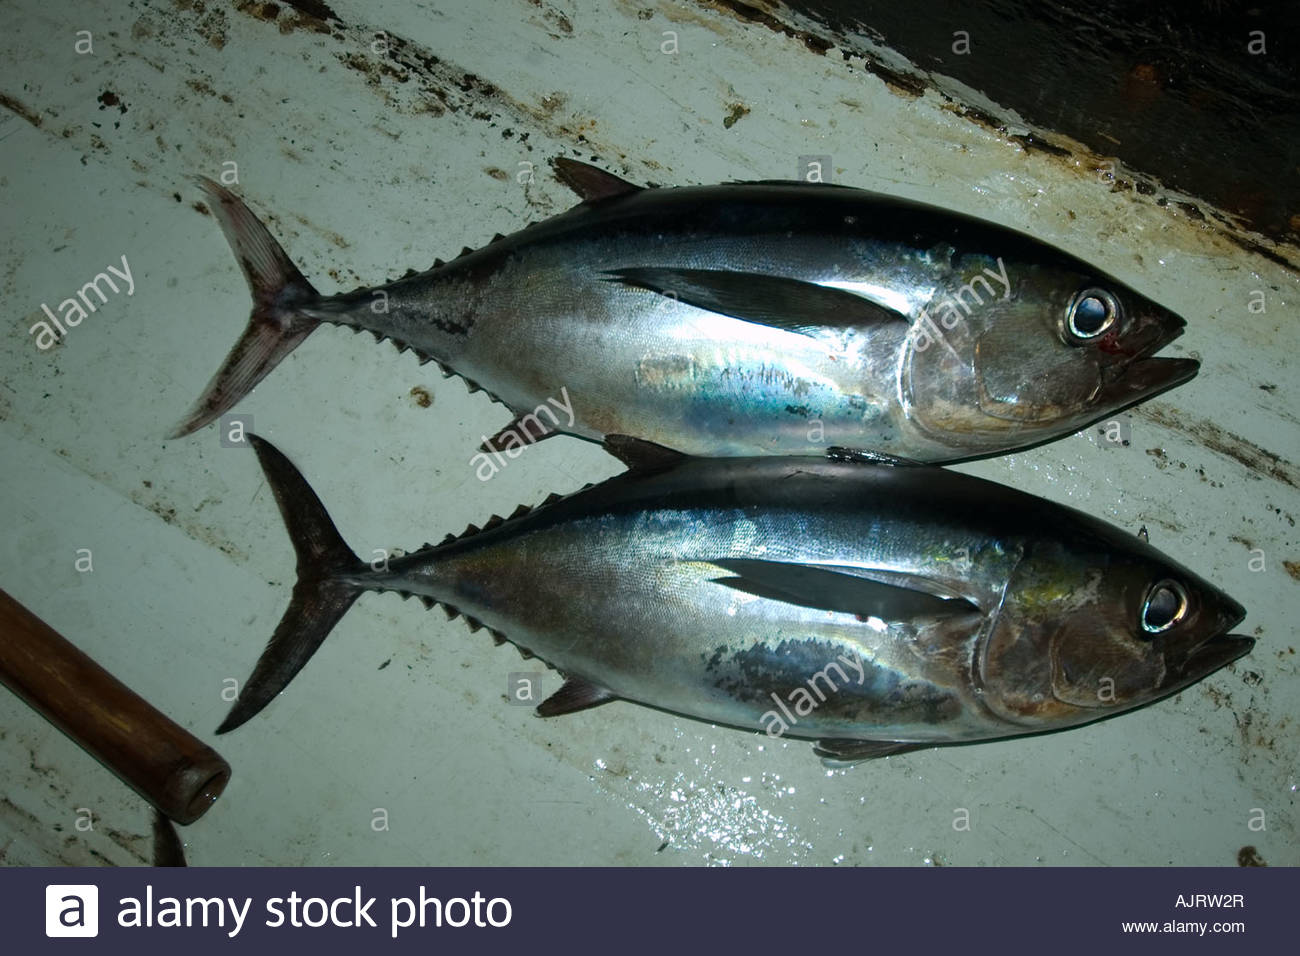 Bigeye Tuna Stock Photos & Bigeye Tuna Stock Images.